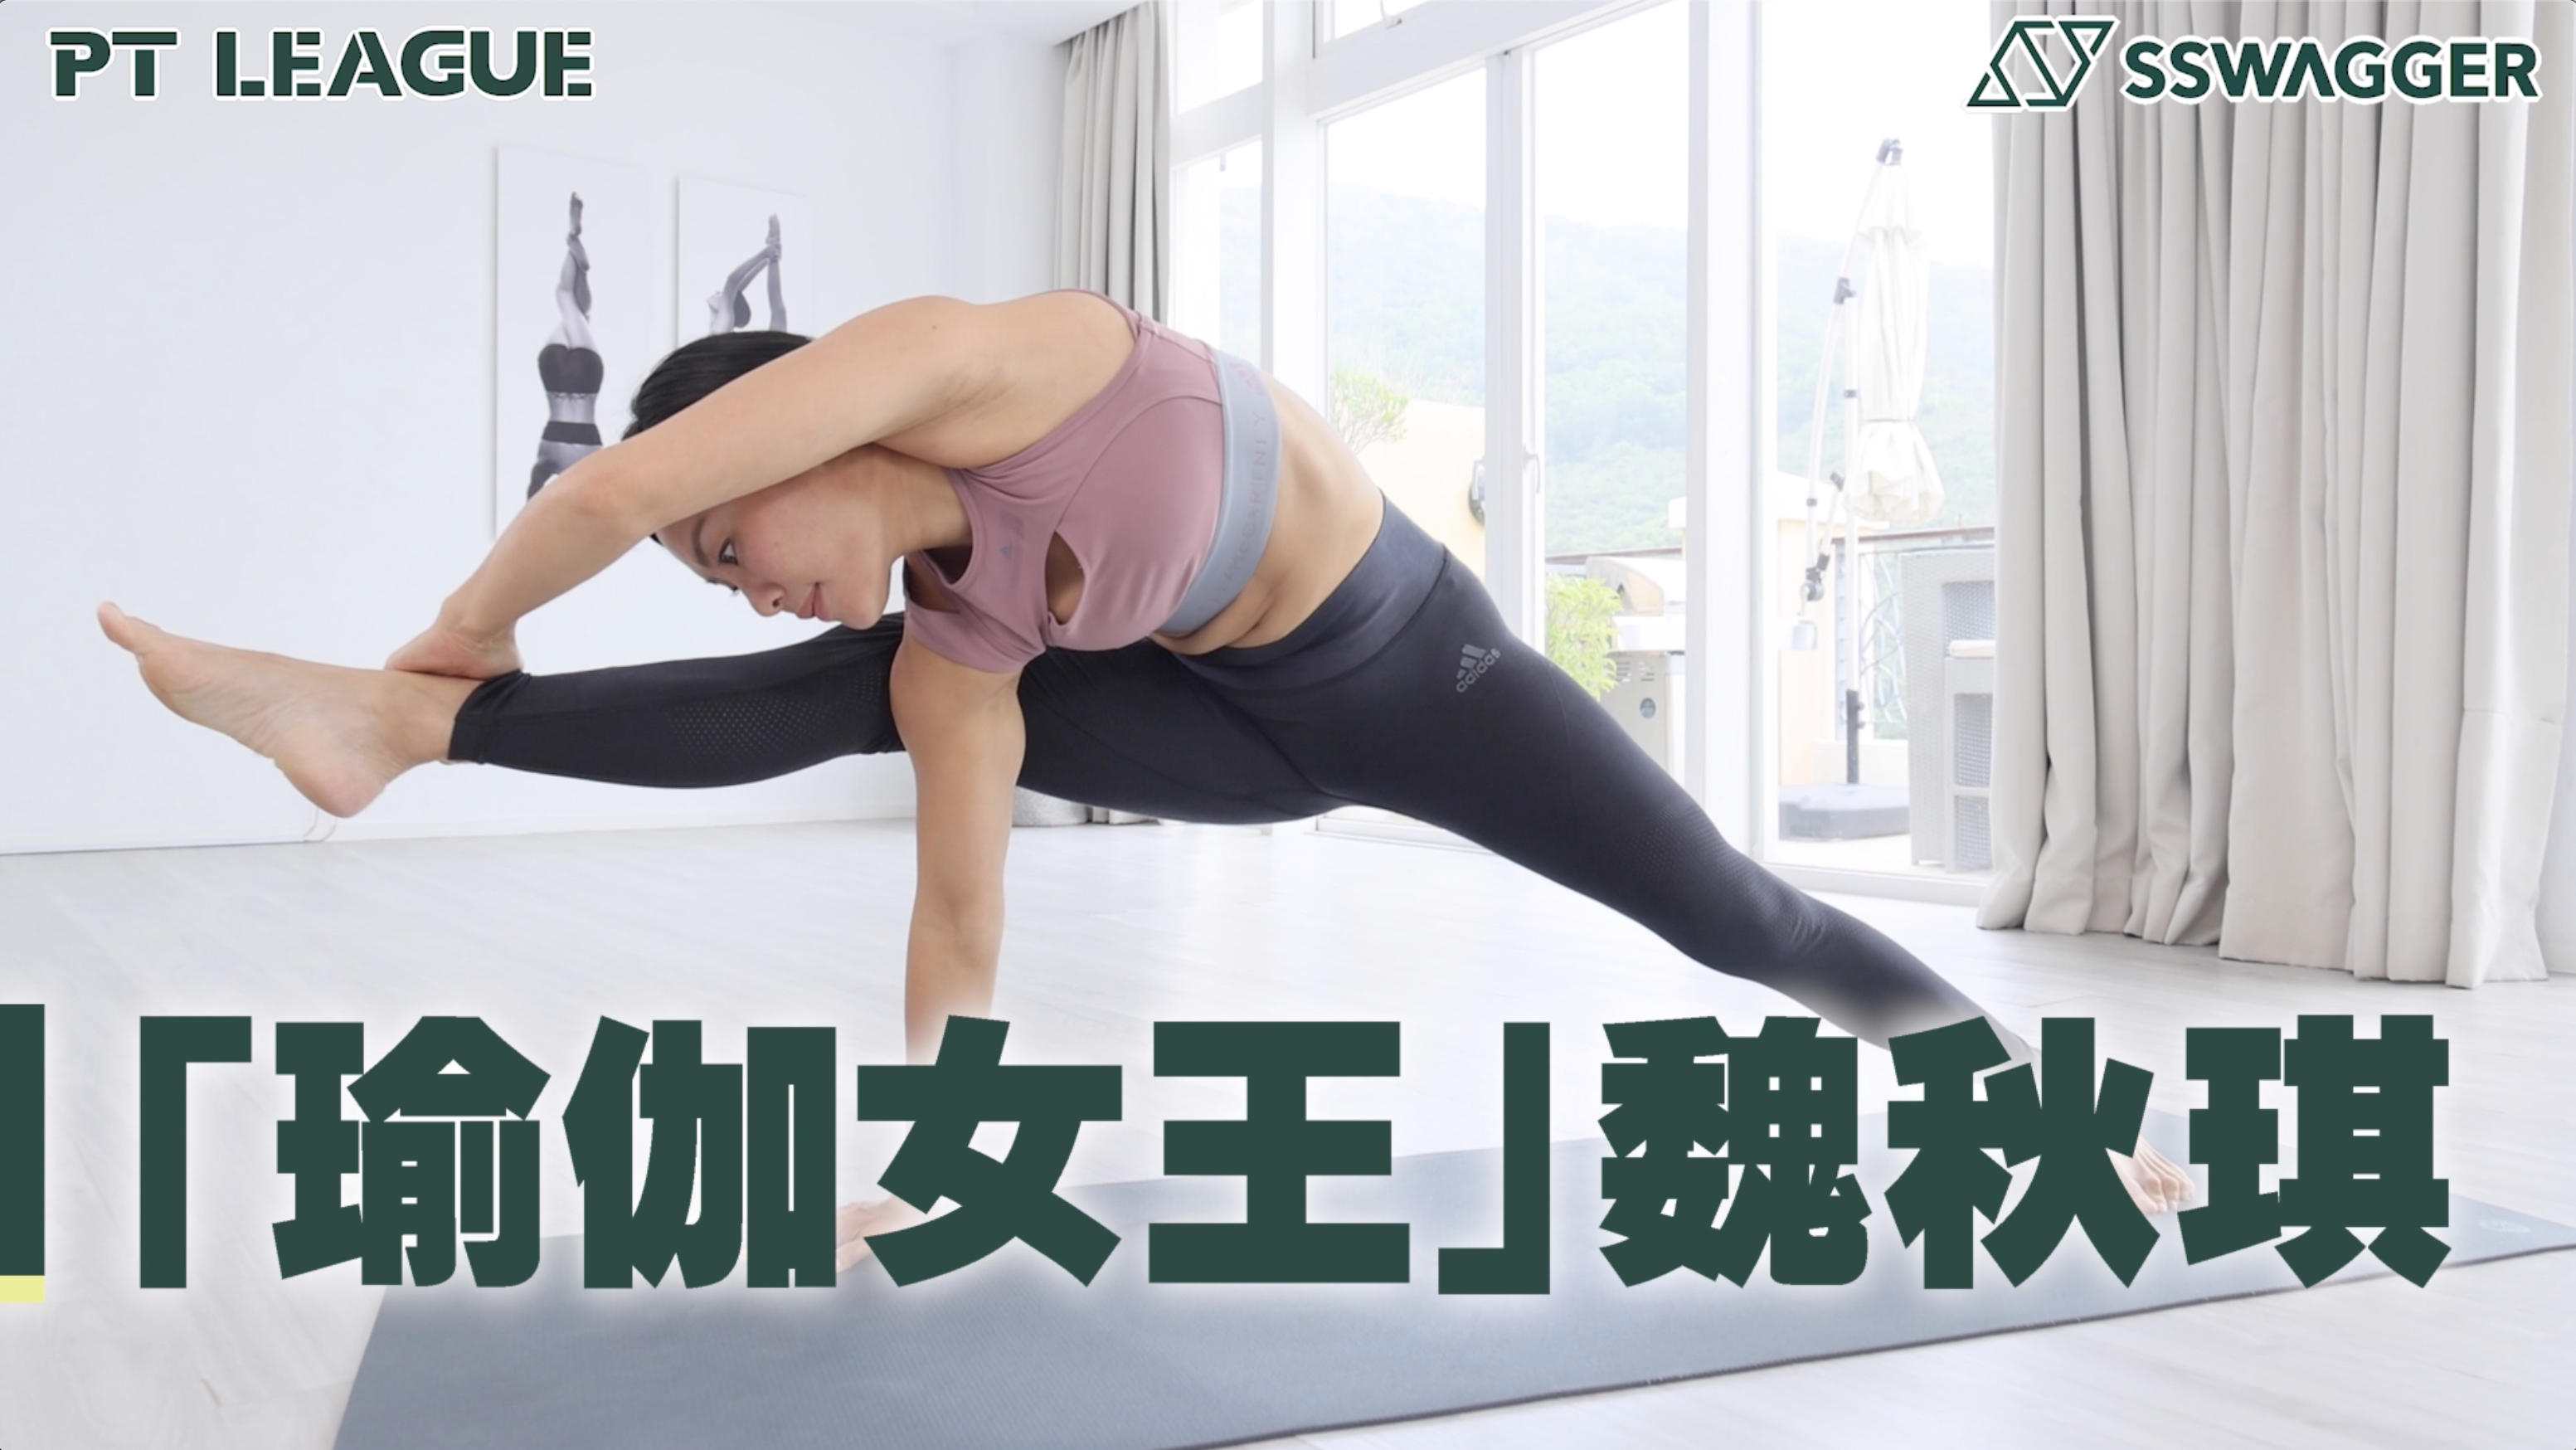 【SSwagger Academy - PT League】「瑜伽女王」魏秋琪的過去、現在、未來